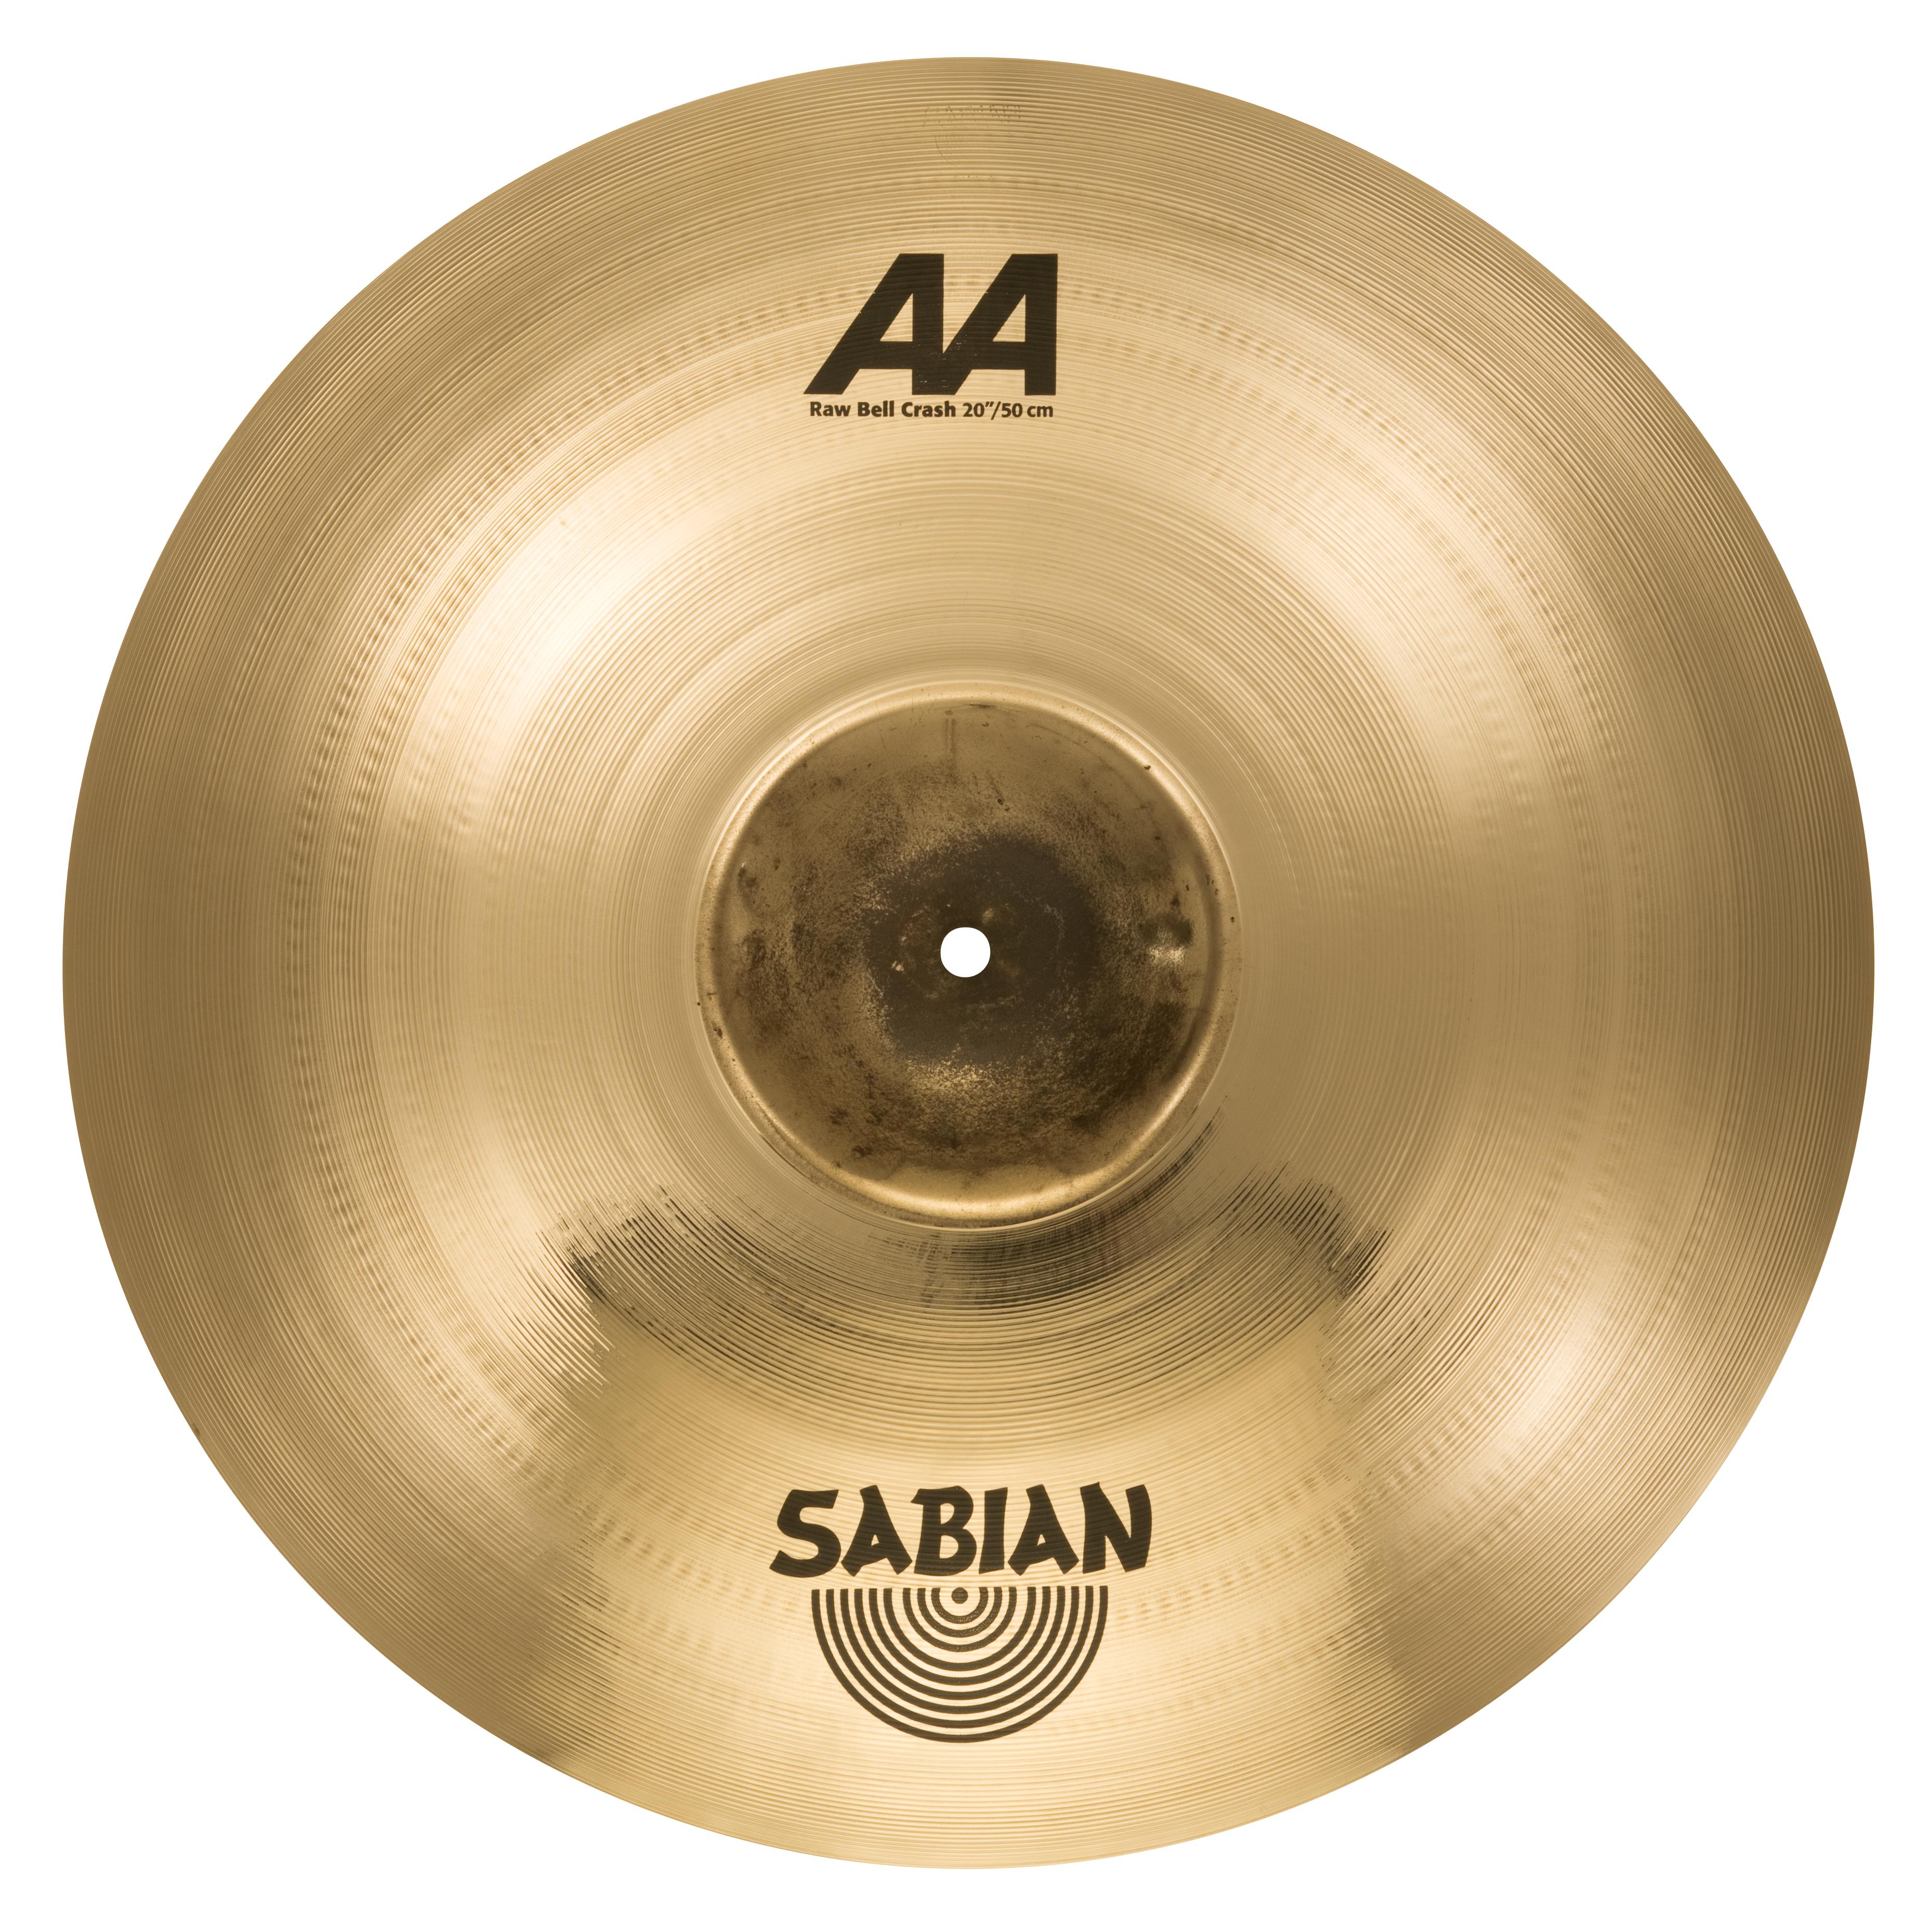 "SABIAN 20"" AA Raw Bell Crash Brilliant Finish Cymbal 2200772B"